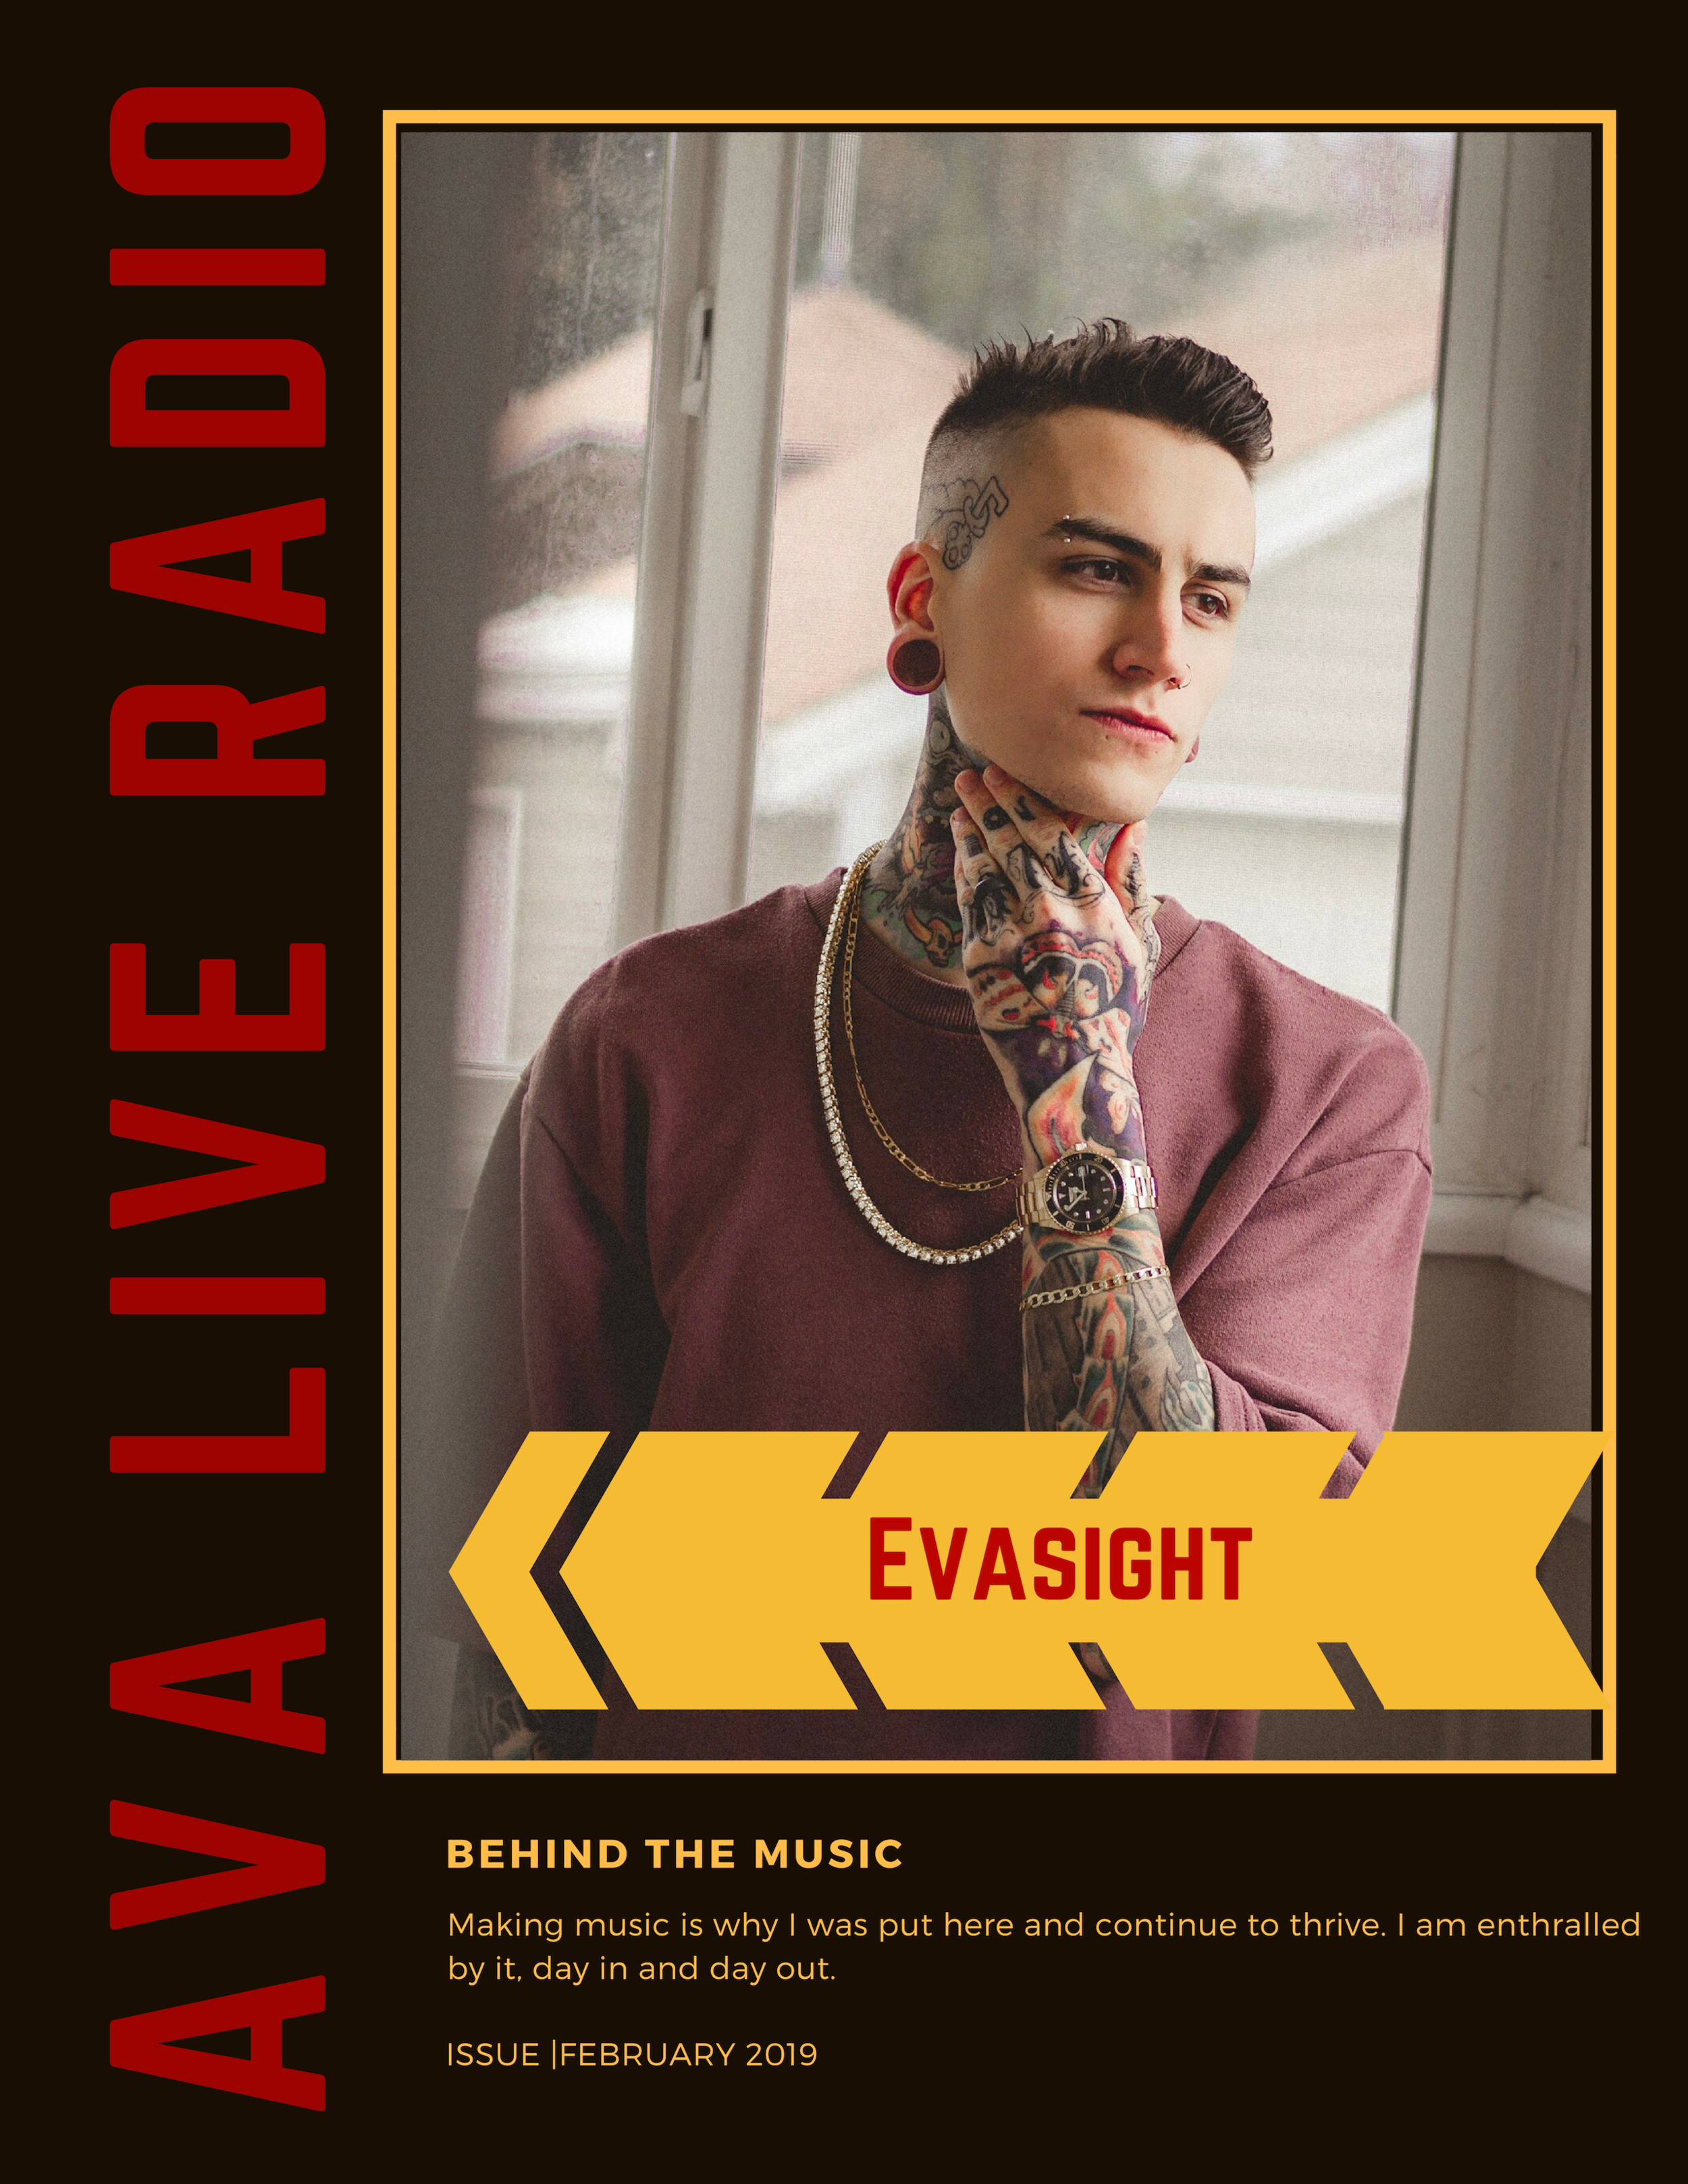 evasight - AVA LIVE RADIO(2).png